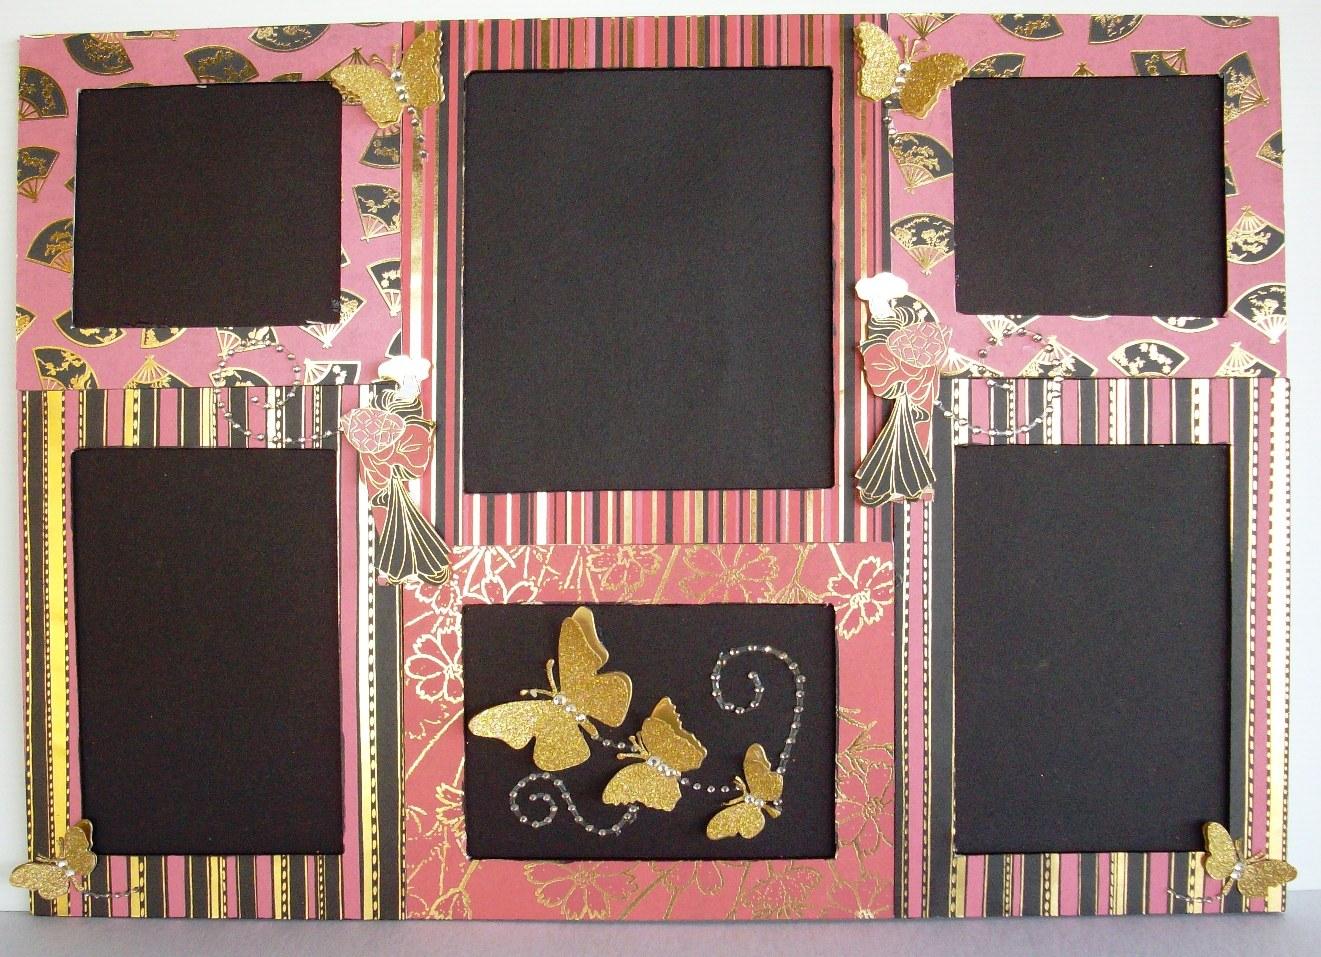 Crafty Kayes Room: Eastern Elements Multi Frame